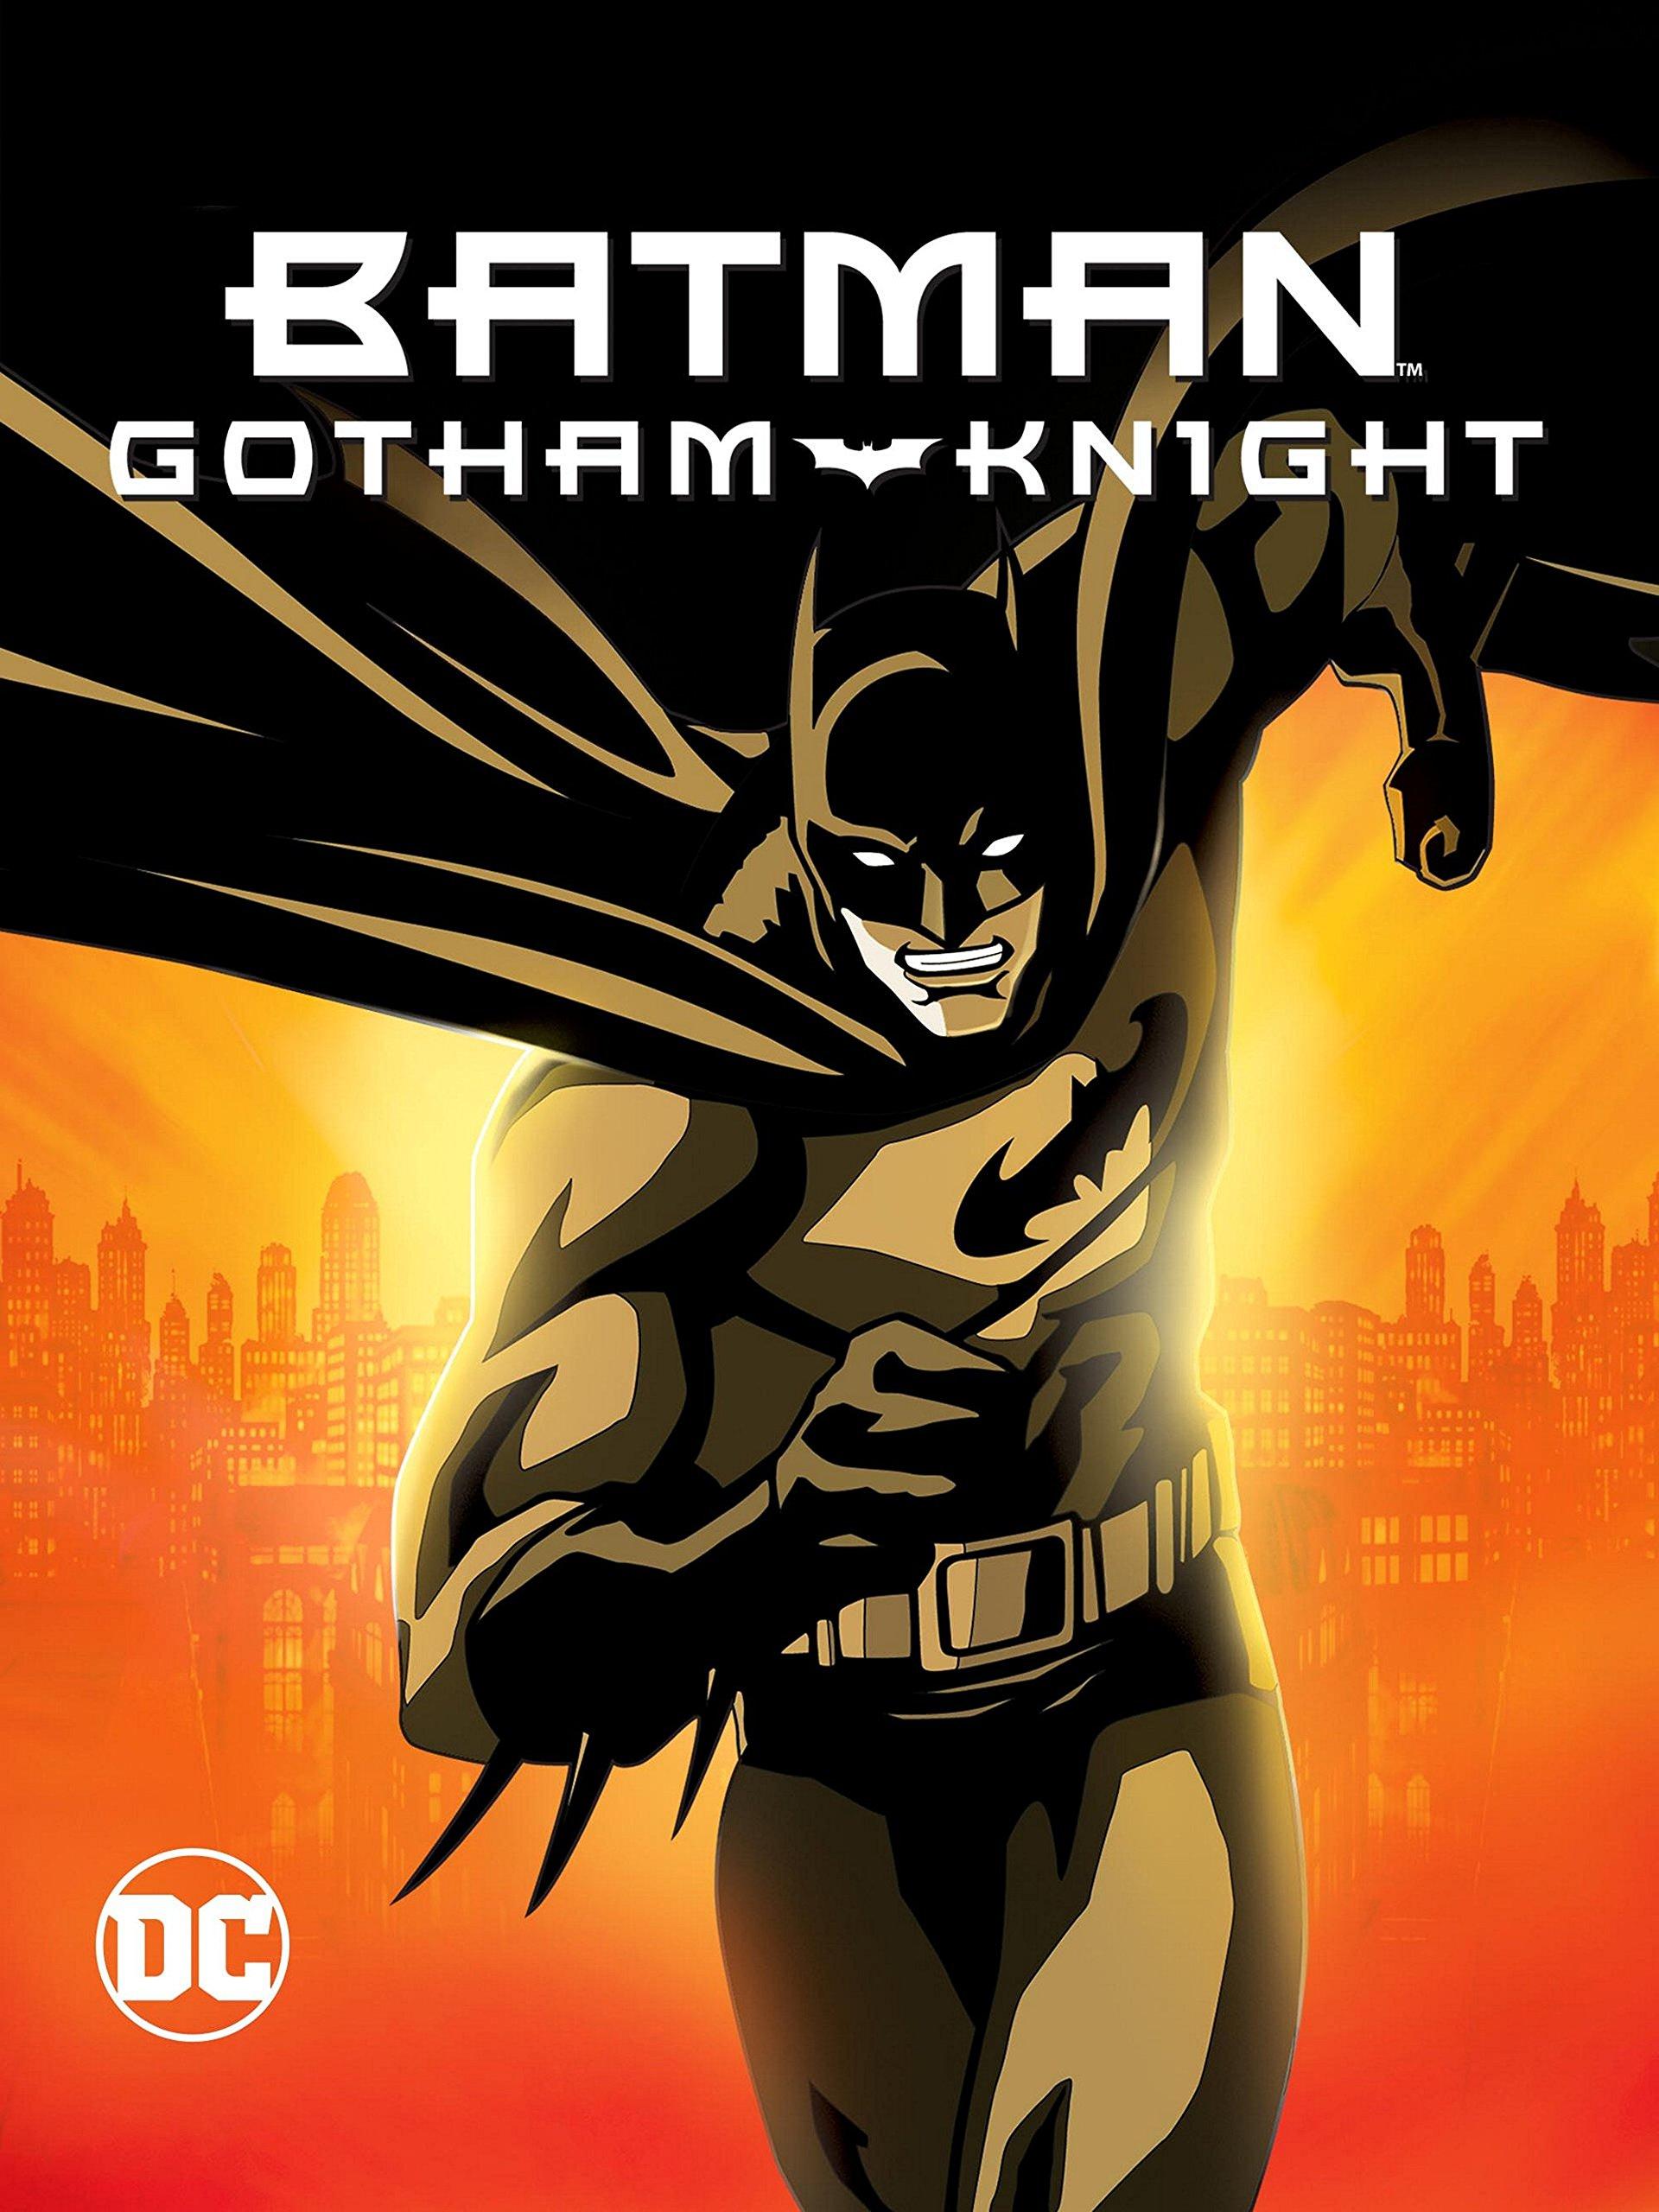 Fashion of the bat an extremely thorough examination of batman s - Amazon Com Batman Gotham Knight Kevin Conroy Gary Dourdan David Mccallum Parminder Nagra Amazon Digital Services Llc